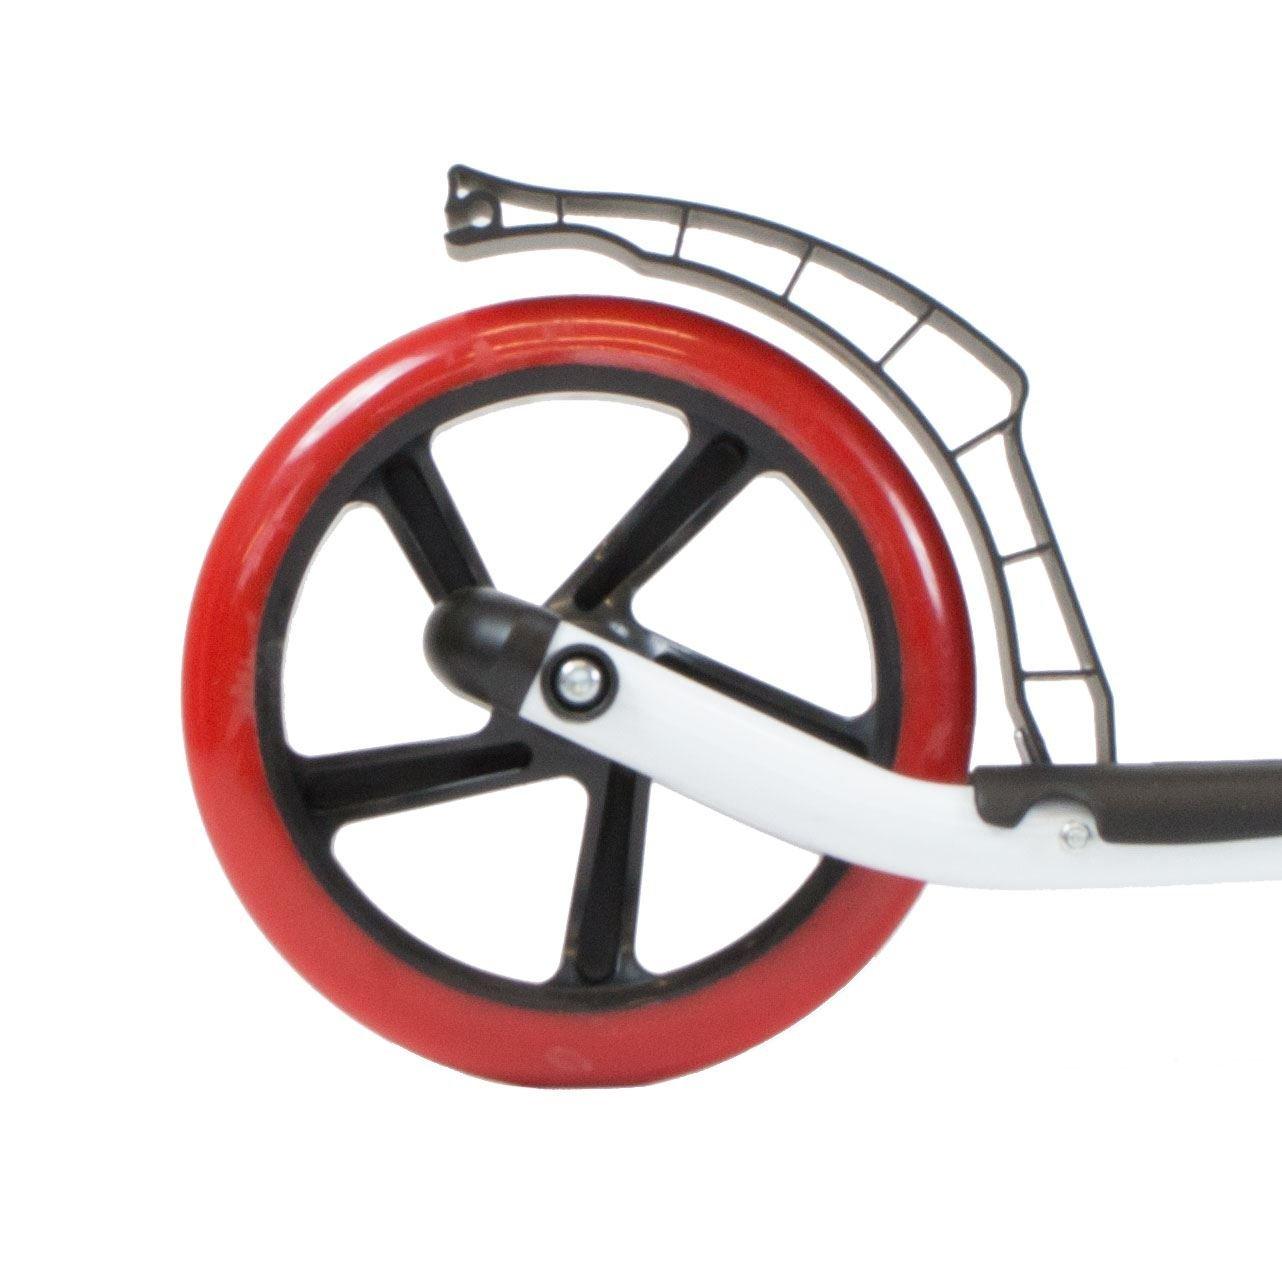 Amazon.com: Bopster Sport Pro - Patinete plegable para ...